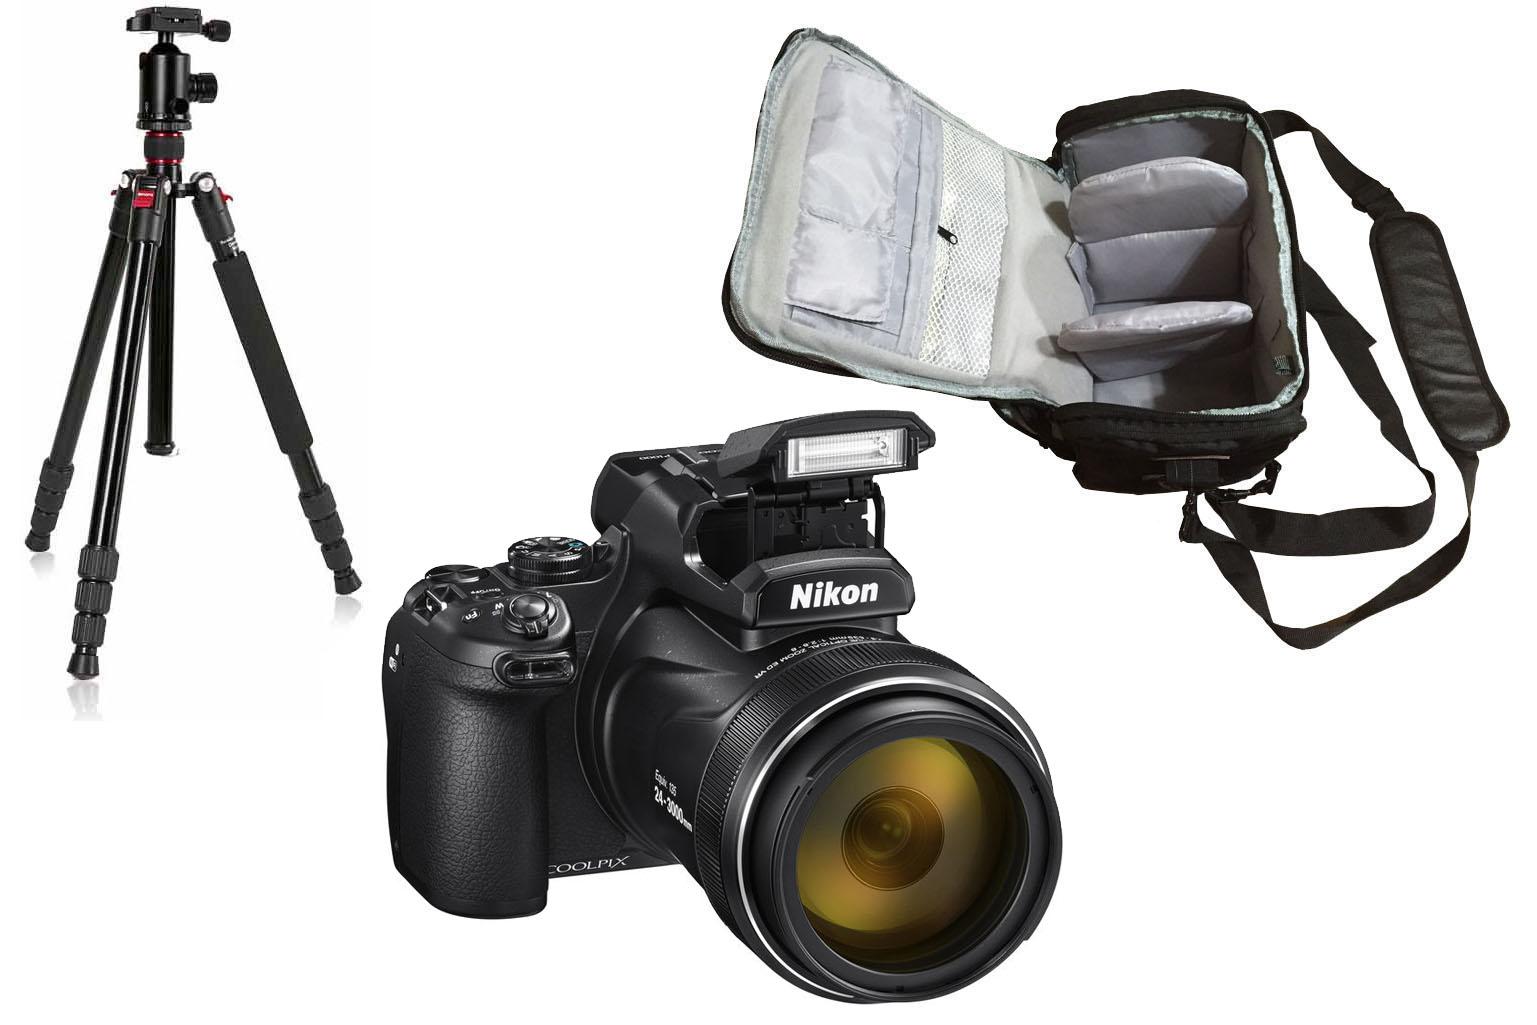 Nikon COOLPIX P1000 + Camera Bag + Tripod Kit